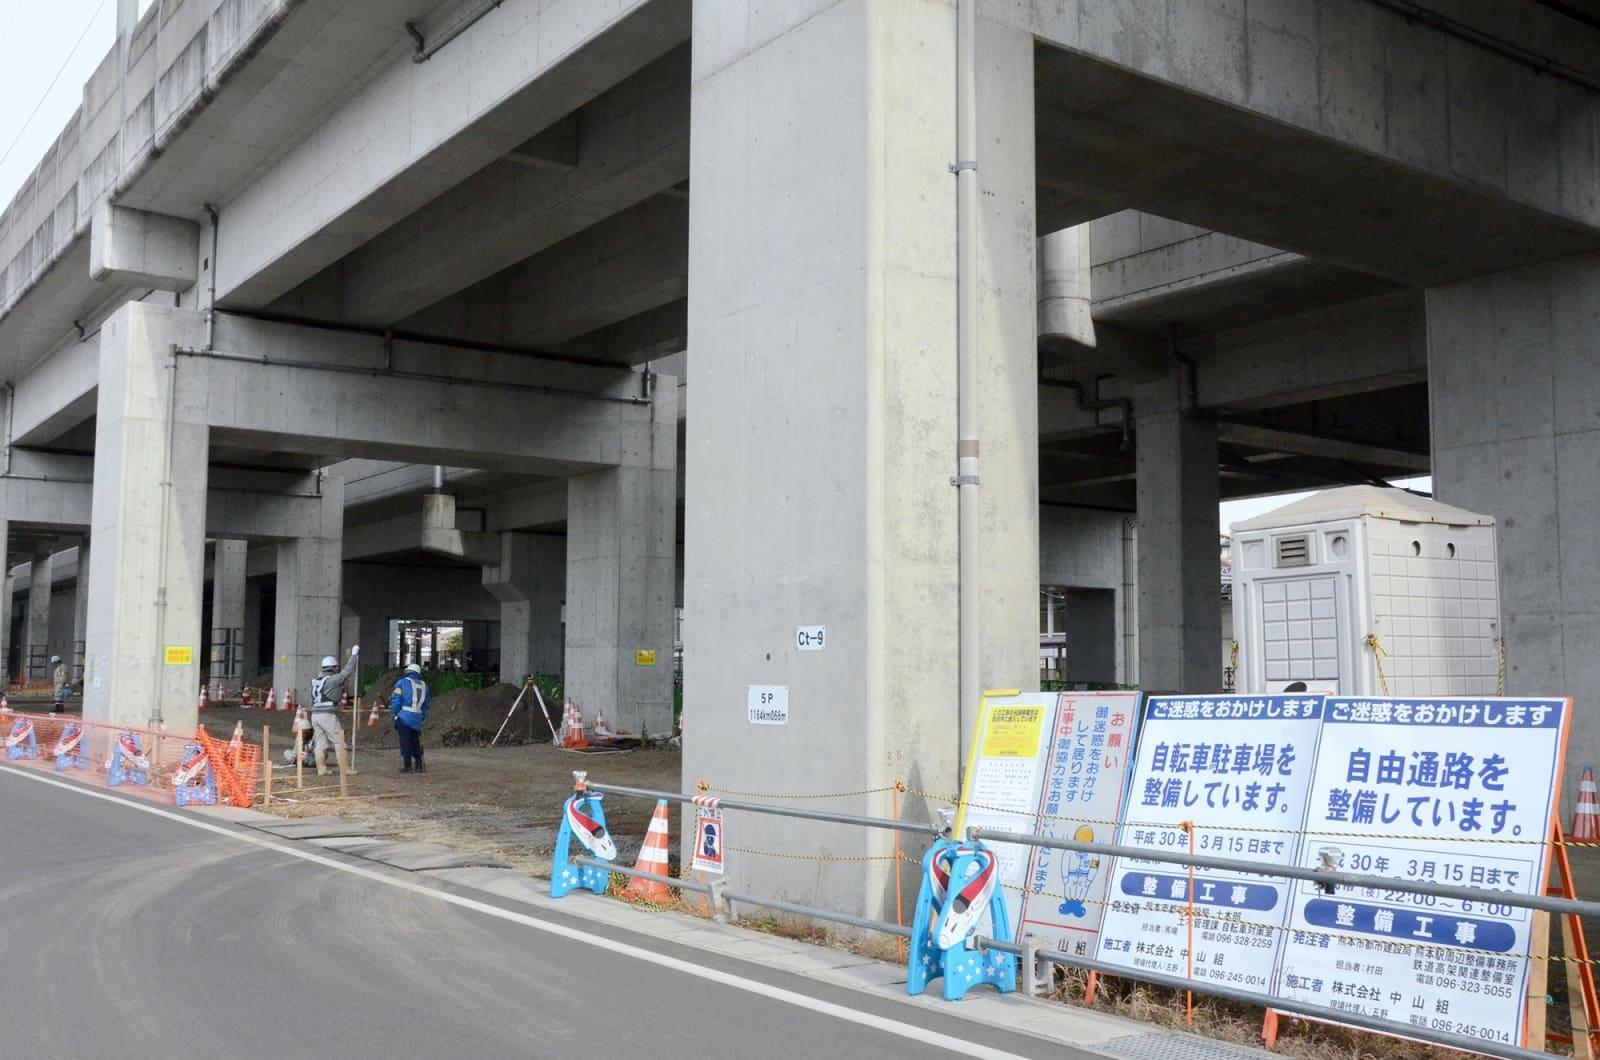 JR上熊本駅の南側の高架下